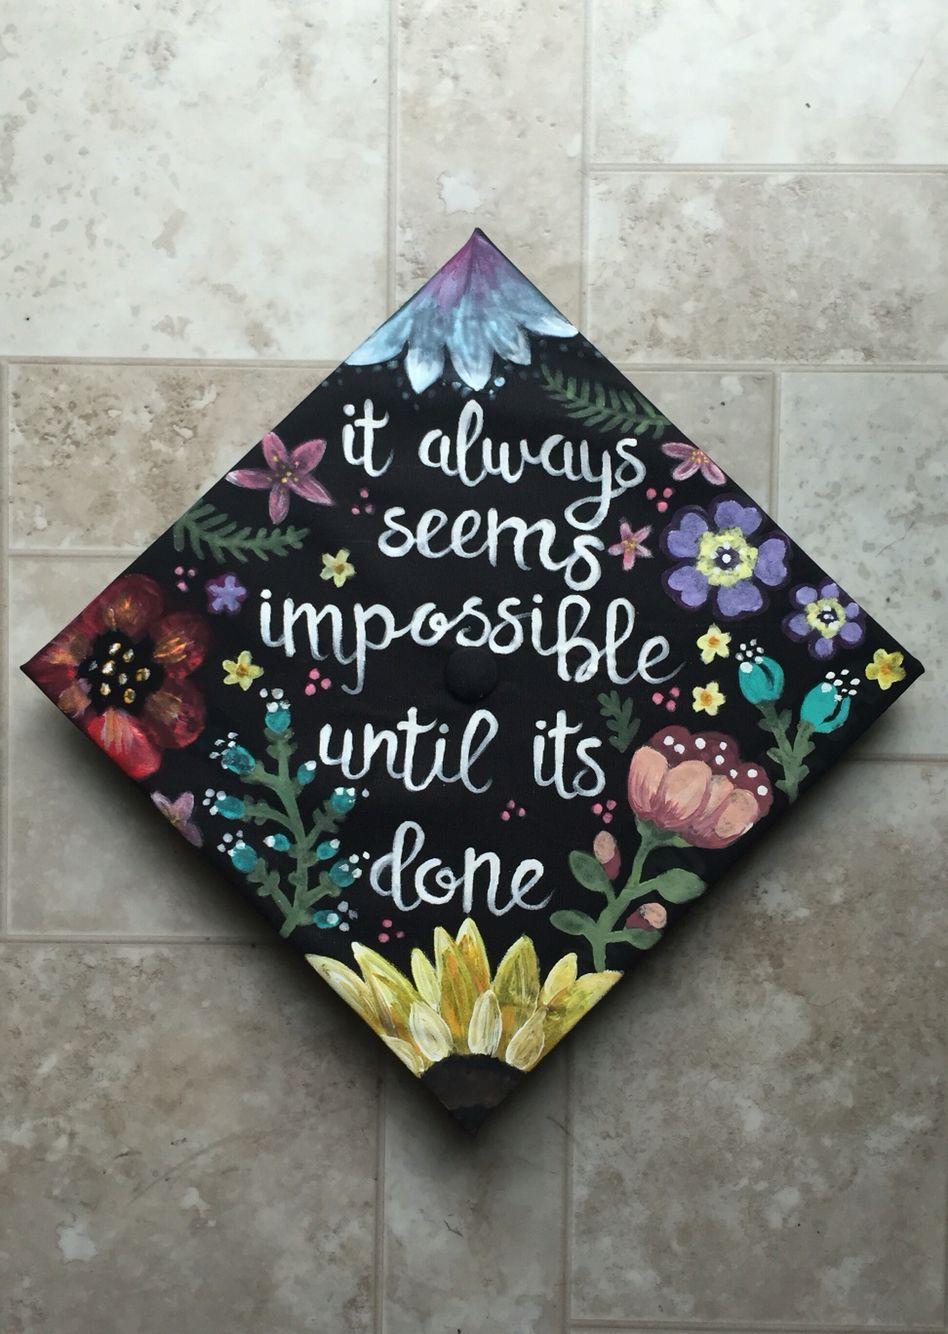 Decorating graduation cap ideas for teachers - Graduation Cap Design